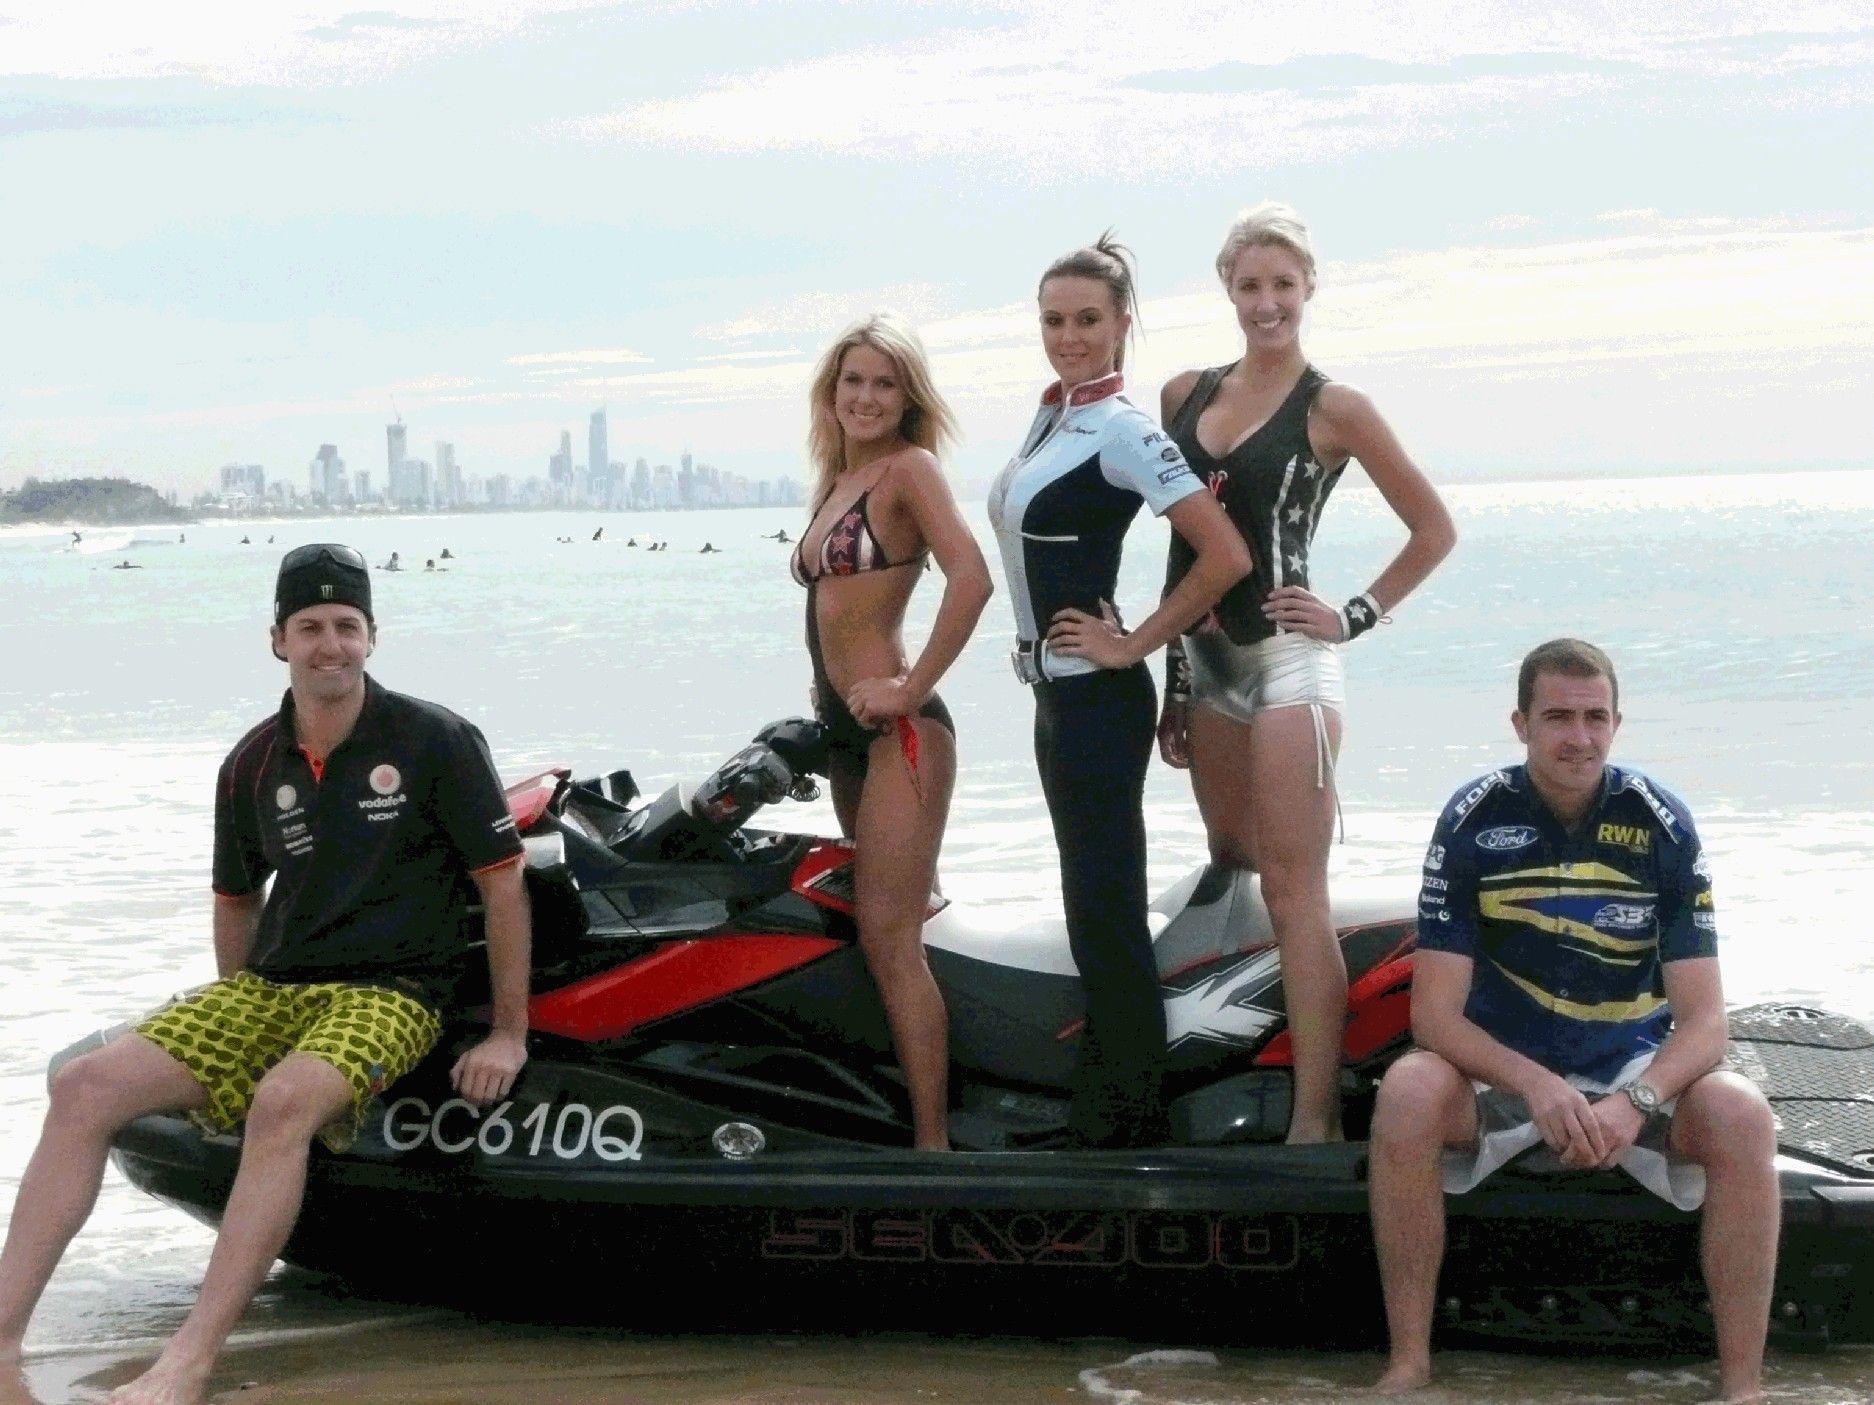 V8 Supercar Drivers Jamie Whincup And Alex Davison Roared Into Burliegh Beach By Jetski Today Bearing The Models Revealing Jet Ski Grid Girls Bikini Models